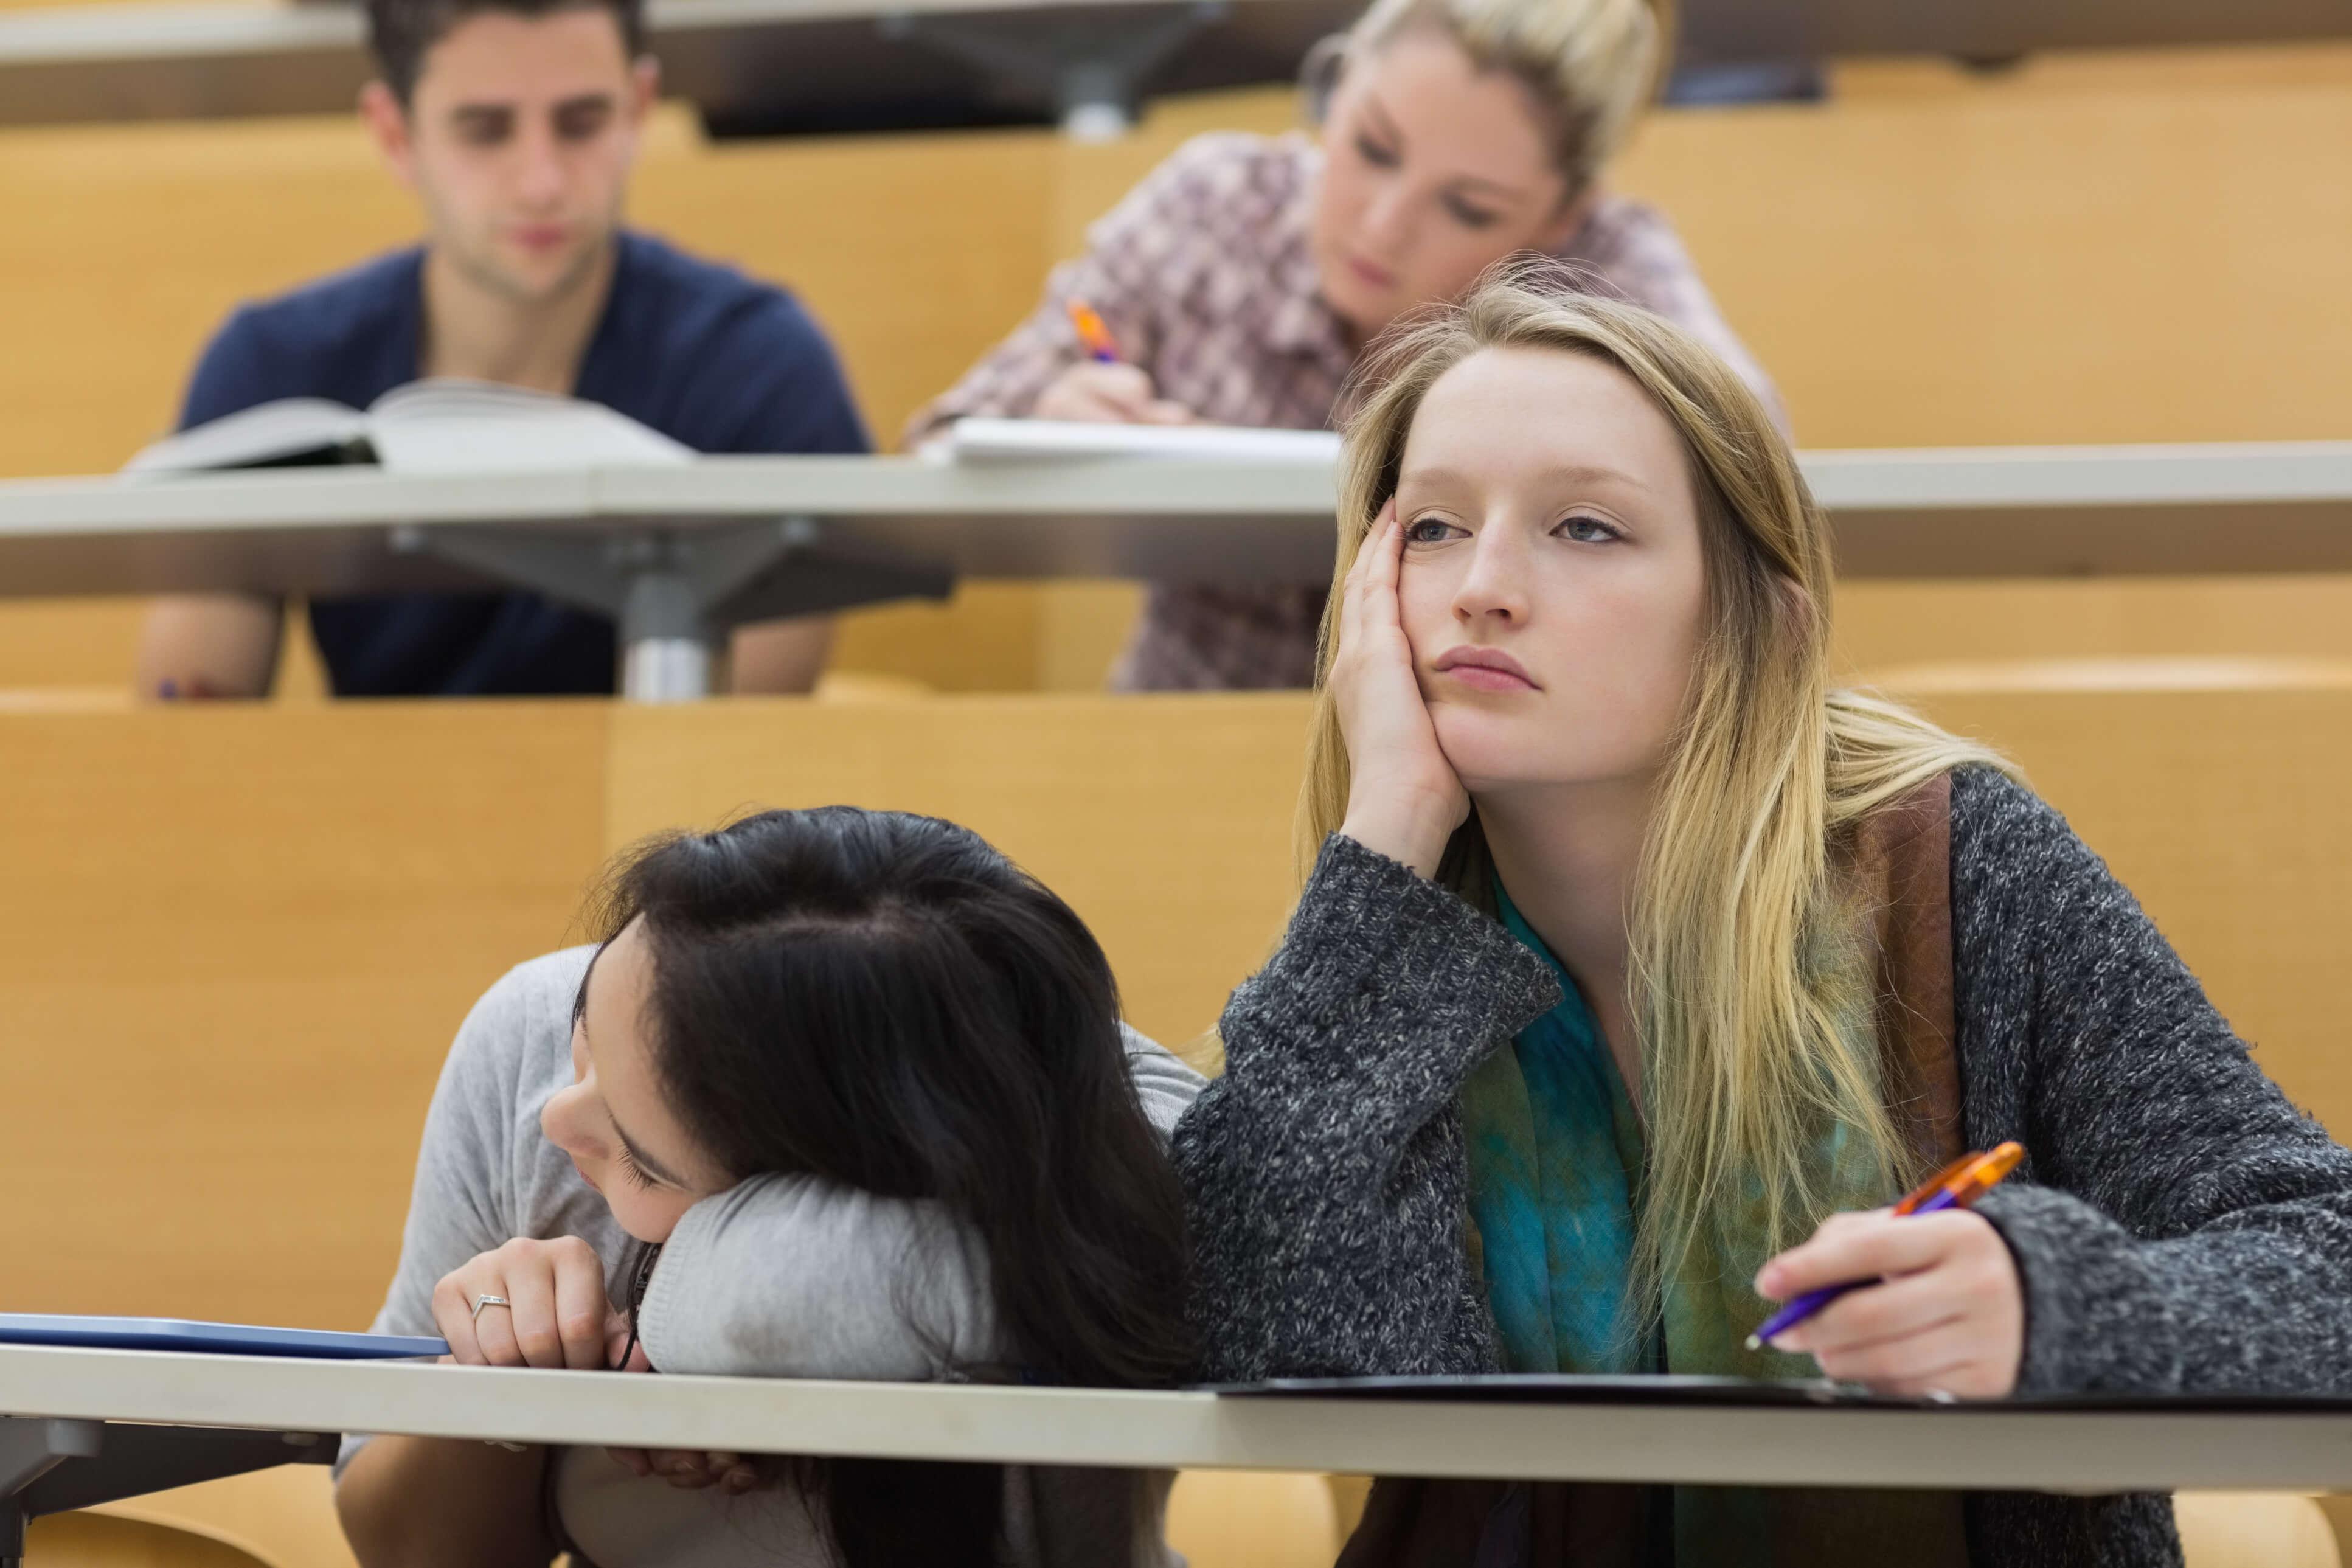 LS Making class less boring